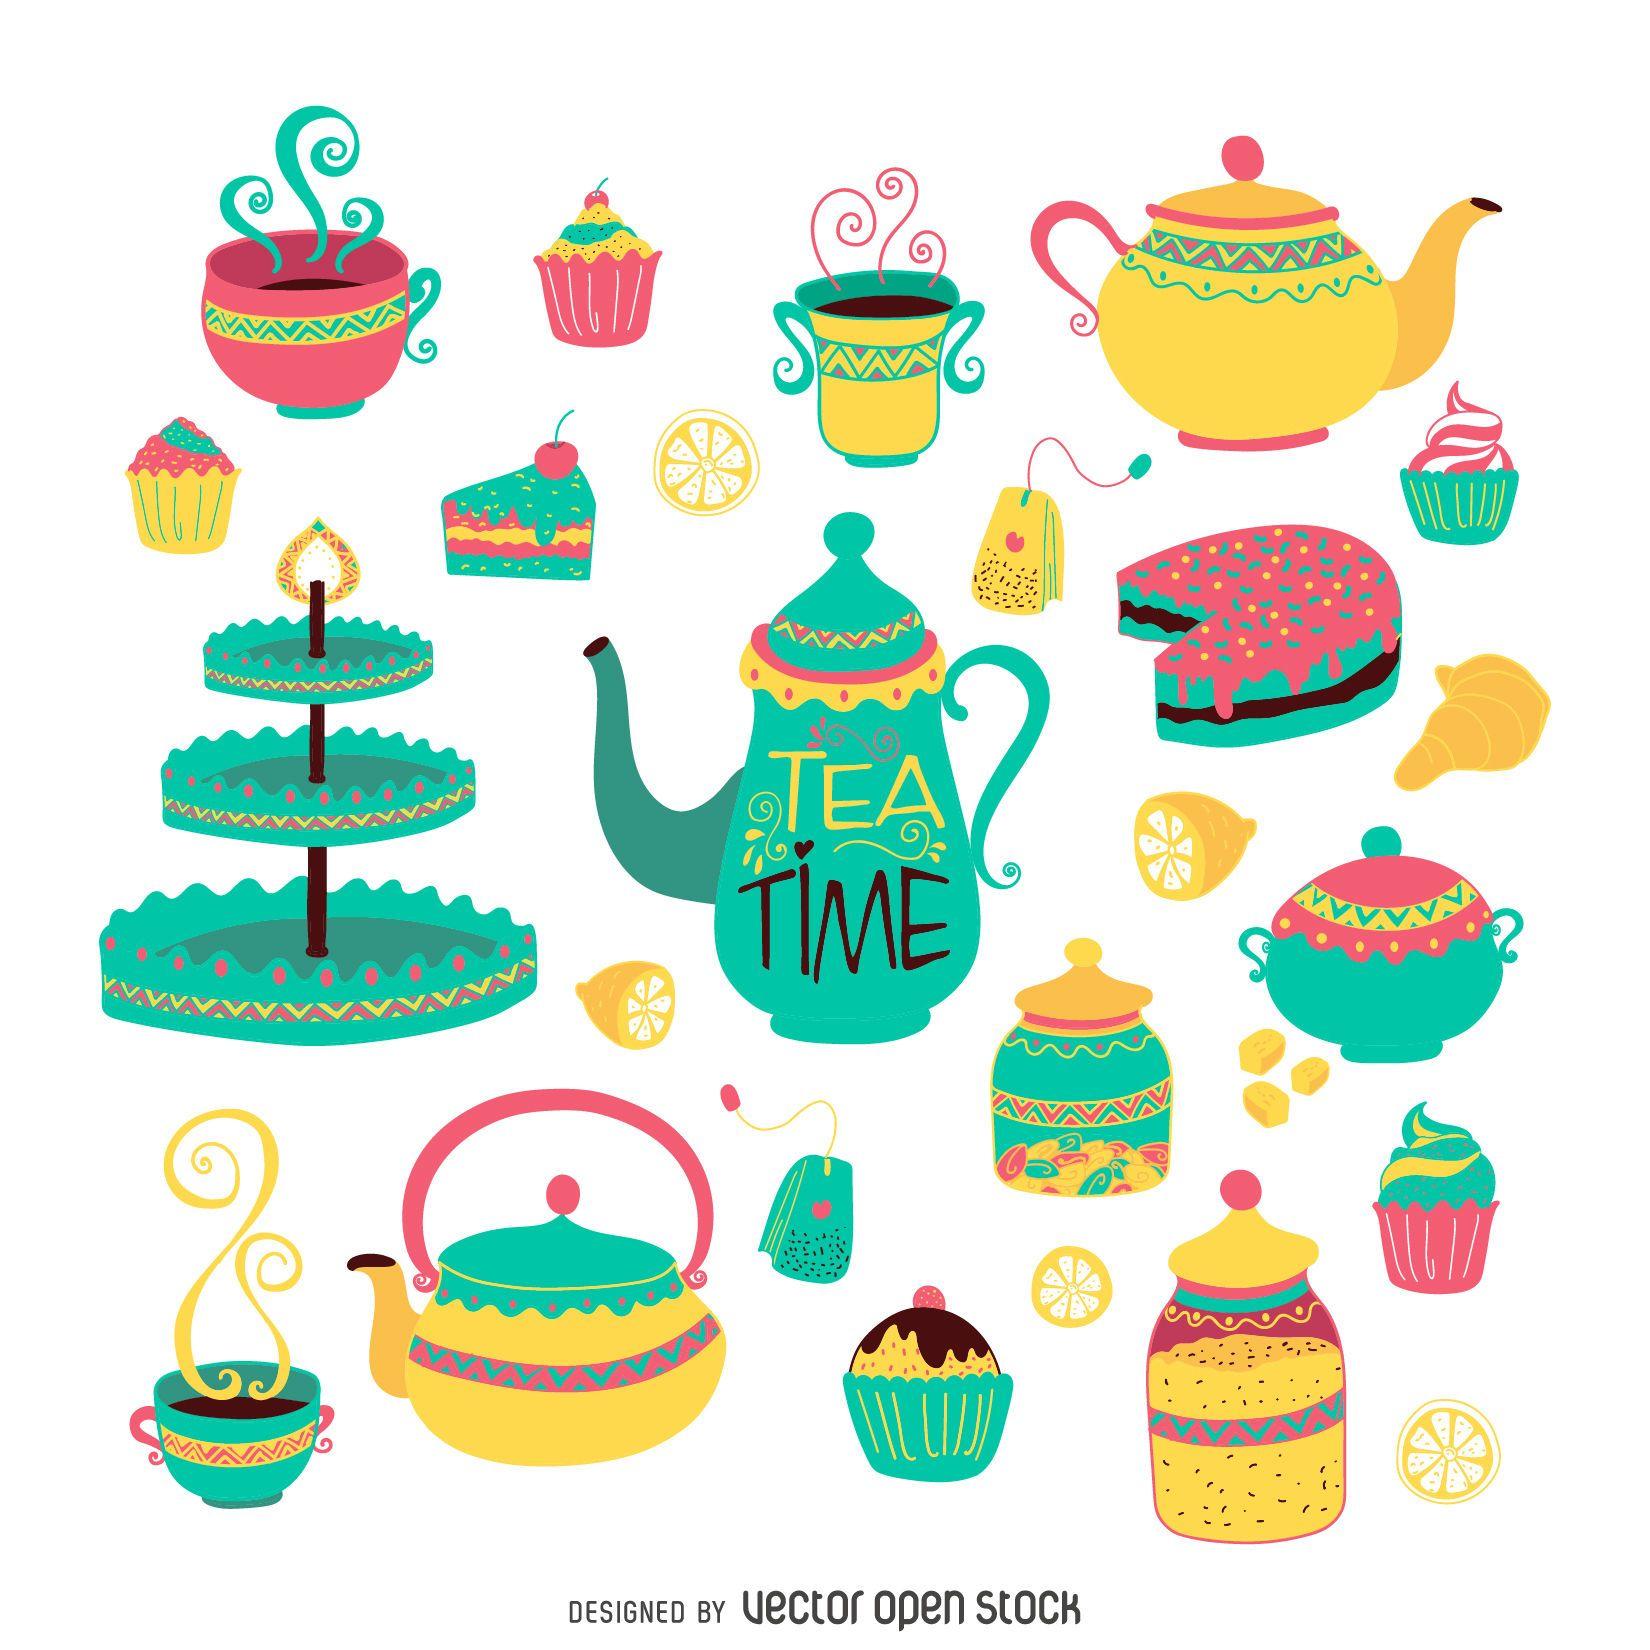 Juego de té plano dibujado a mano